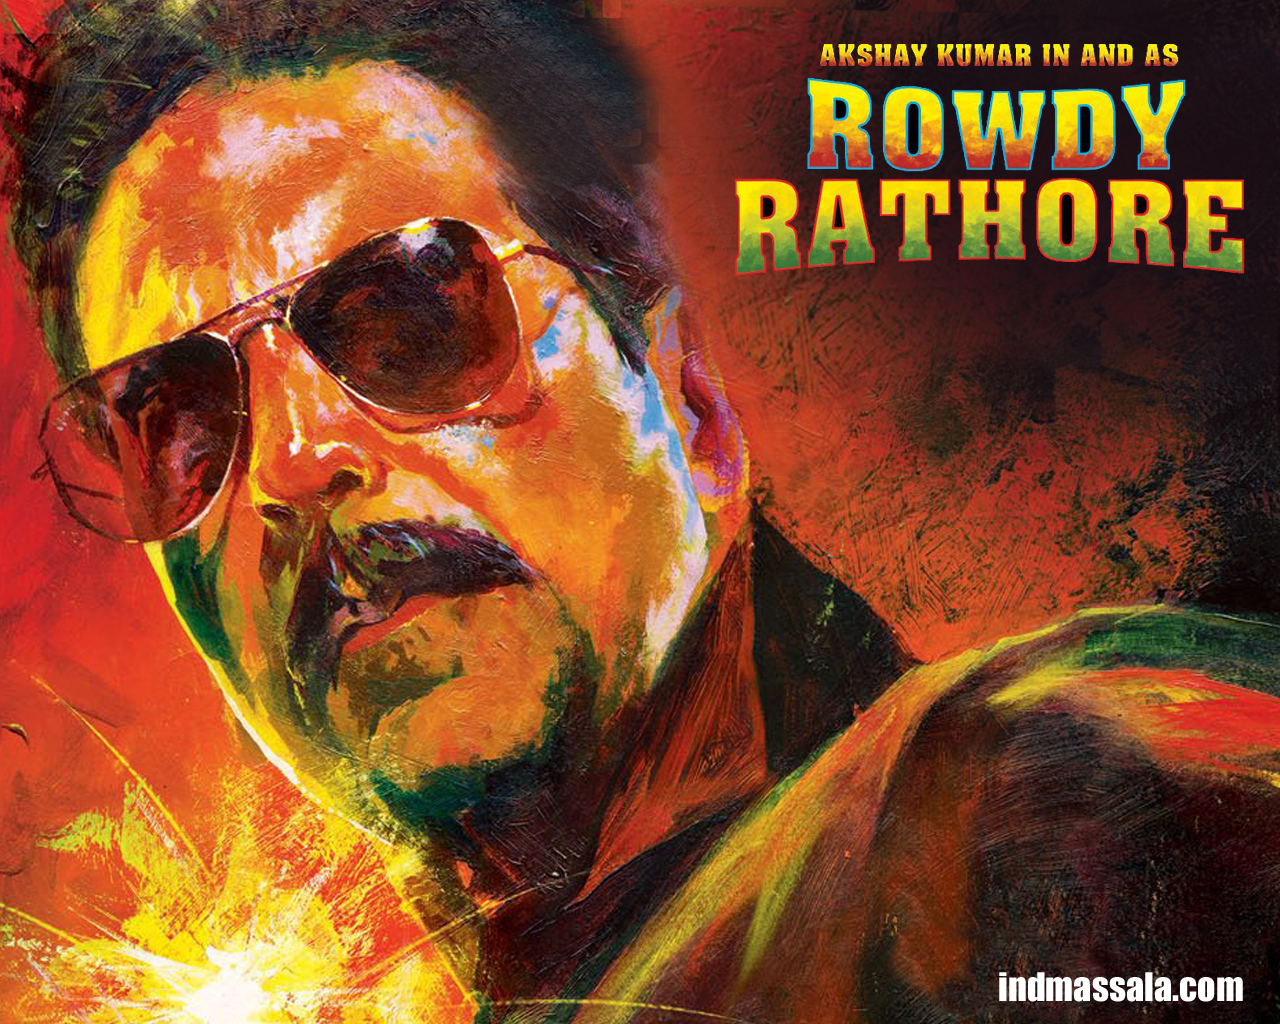 http://2.bp.blogspot.com/-rzZrJqPJ16k/T64Xc8gVLXI/AAAAAAAAB9k/JZ3zvaGE_Gw/s1600/Rowdy-Rathorew-wallpaper1.jpg